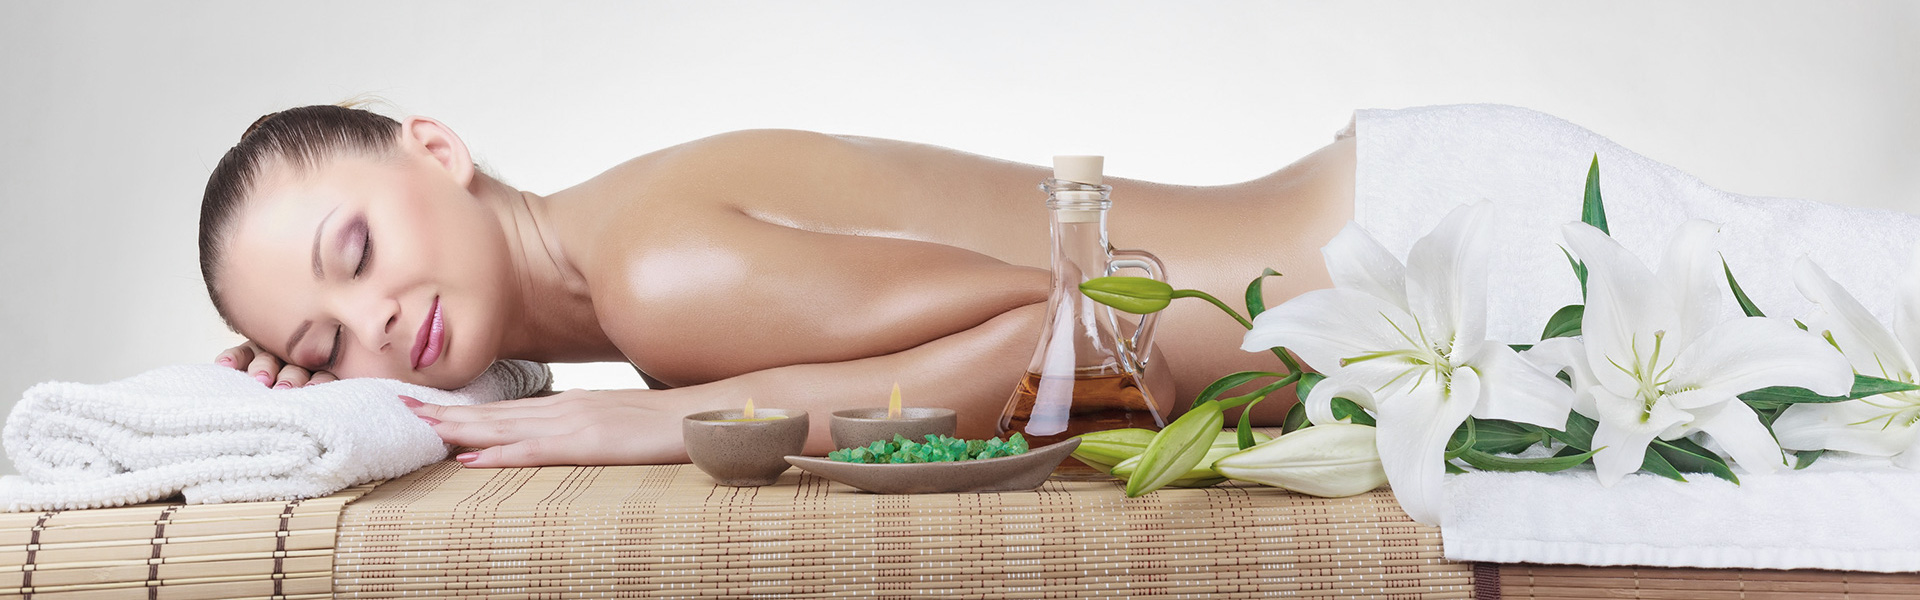 massage_slide